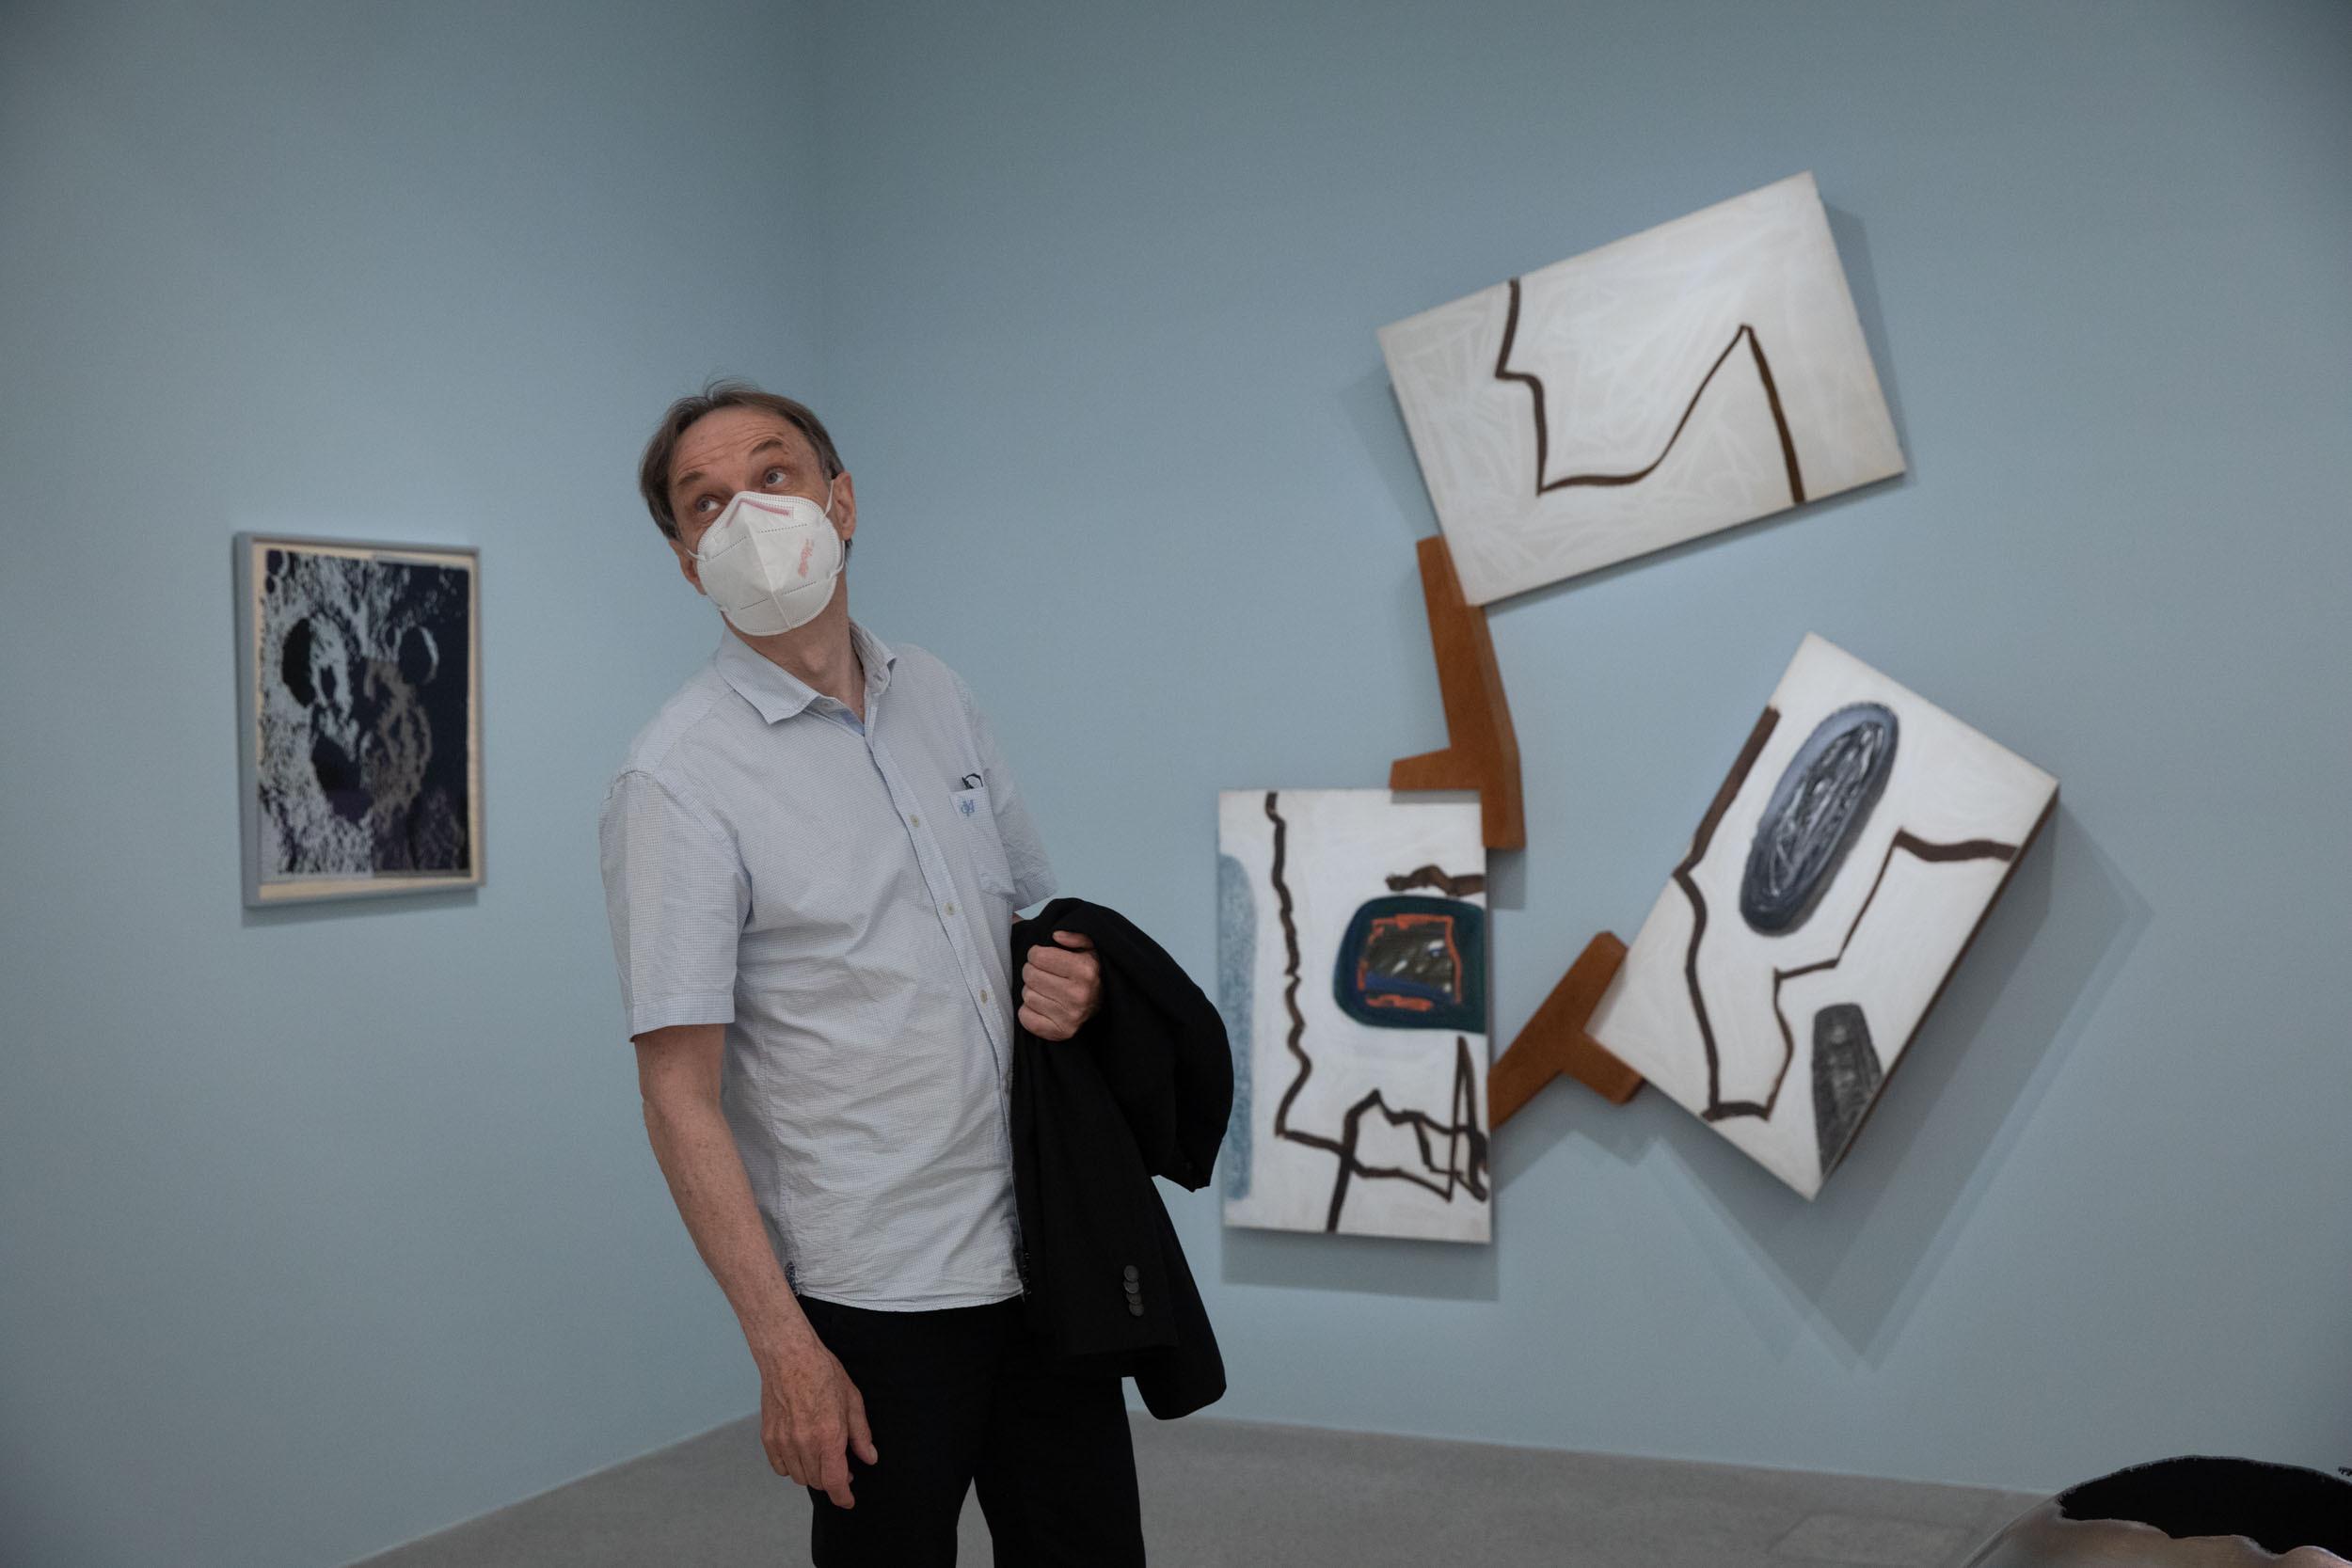 eSeL Foto: Enjoy! Die mumok Sammlung im Wandel. Kurator Rainer Fuchs @ Abstraktion. Natur. Körper (19.6. - 18.4.2022)